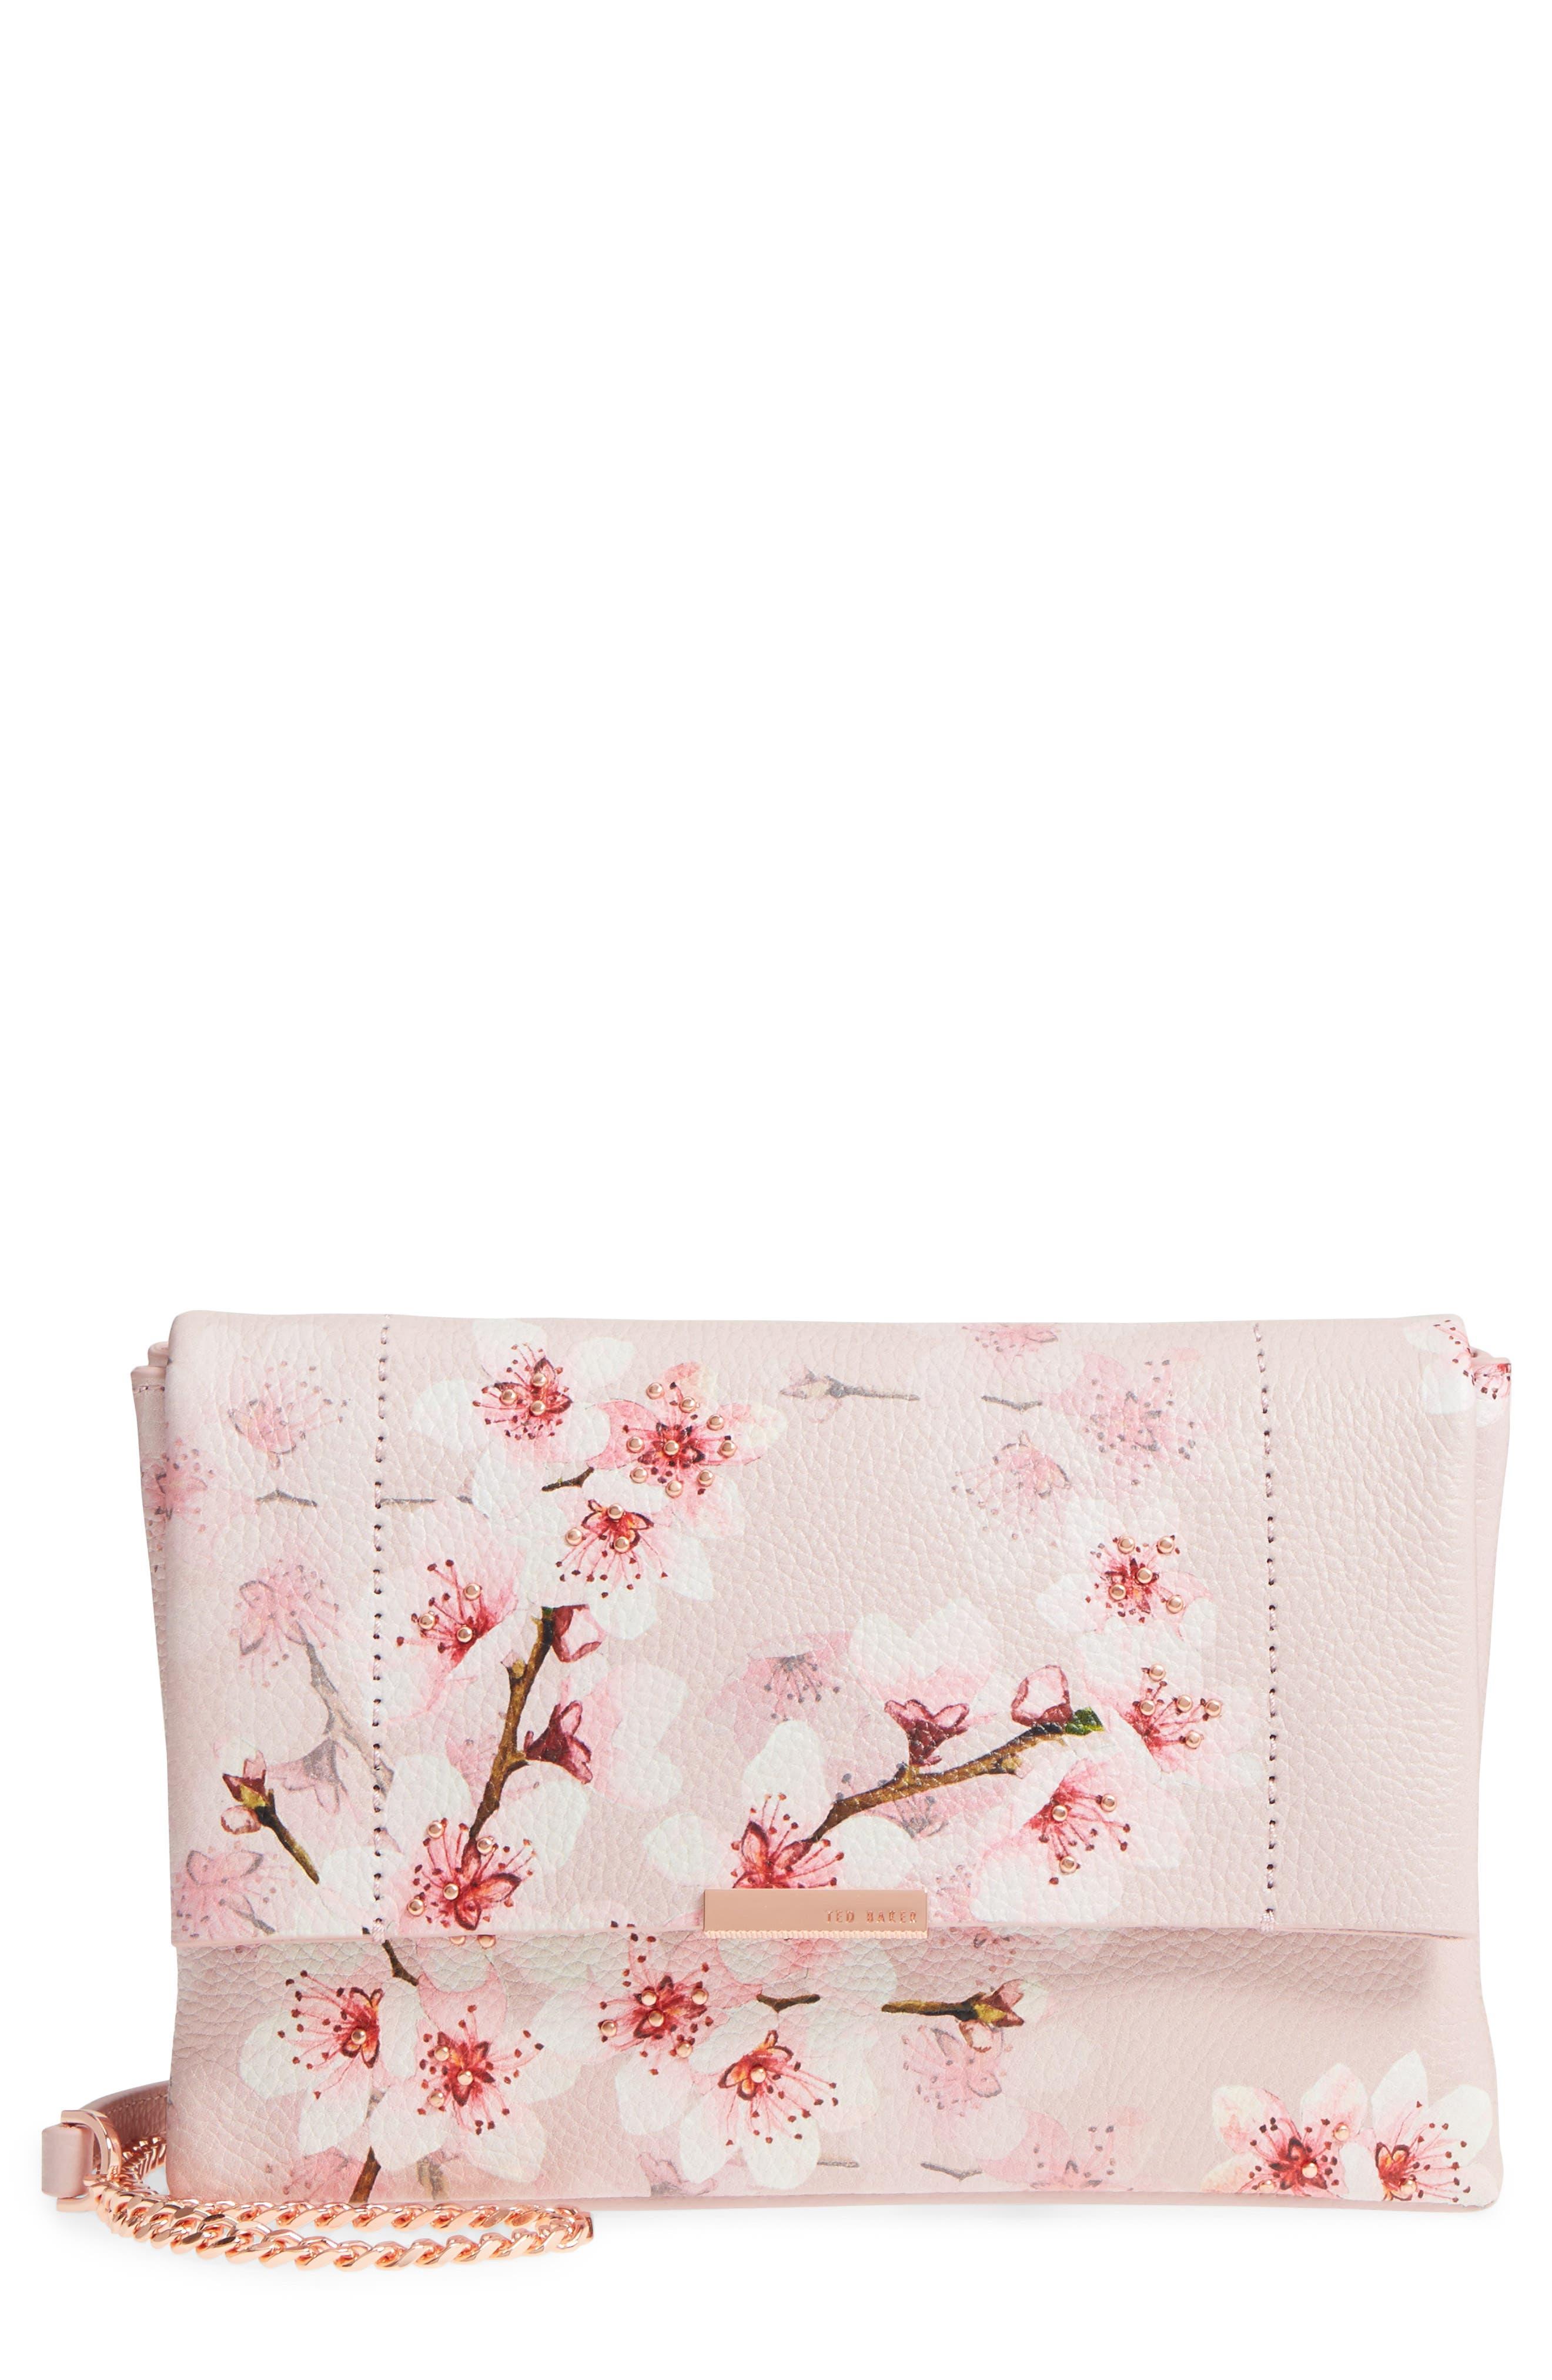 Alternate Image 1 Selected - Ted Baker London Jayy Soft Blossom Leather Crossbody Bag